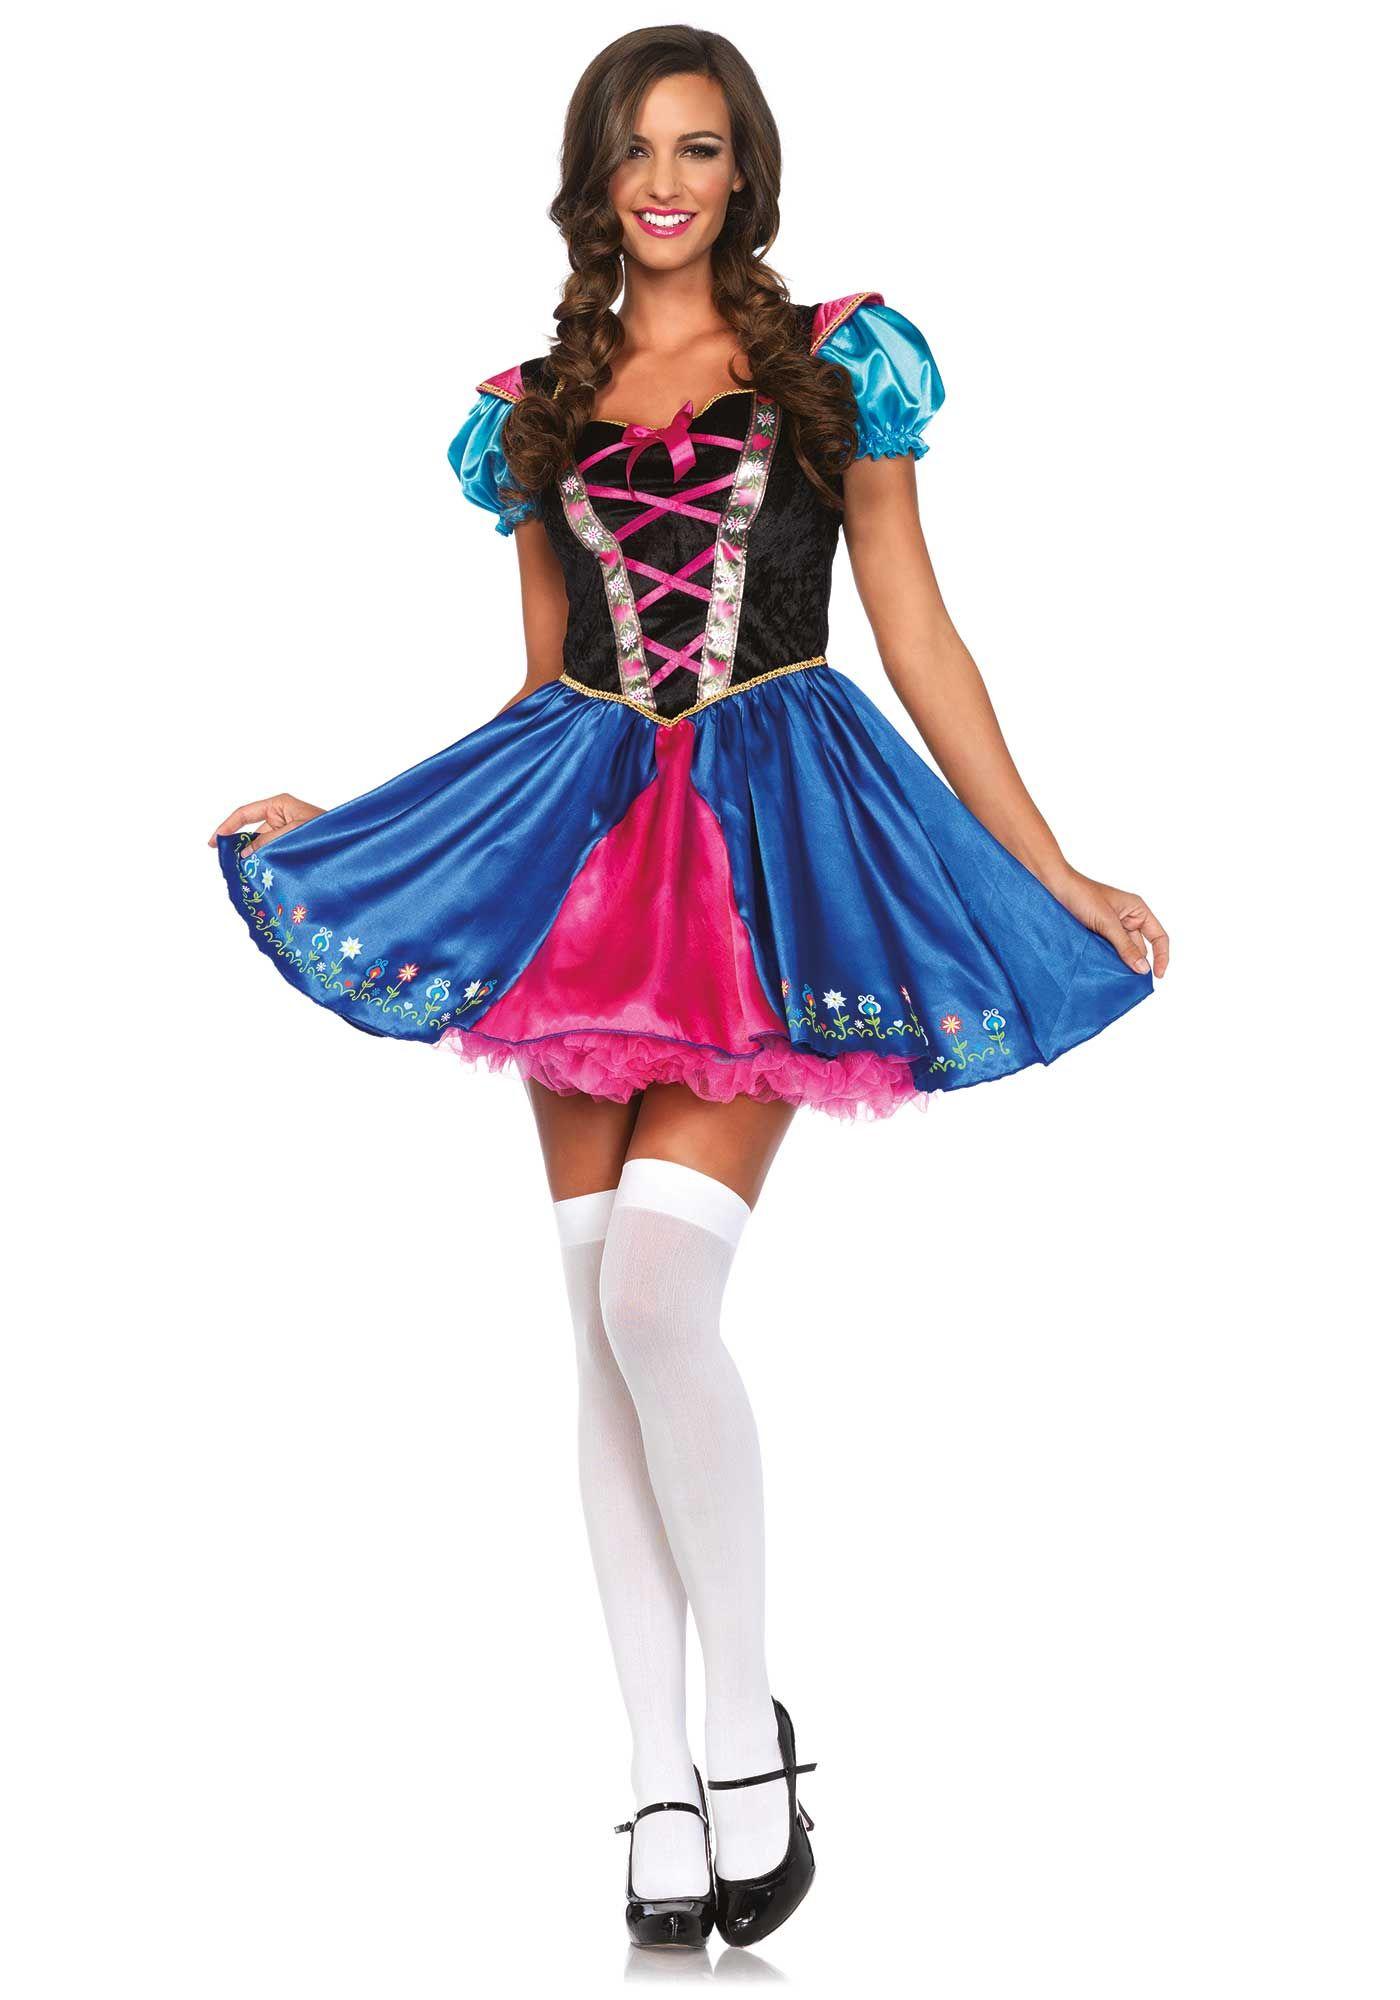 2d81ade69c7c Leg Avenue Alpine Princess Costume #Disney #Anna #Frozen   Yesss ...